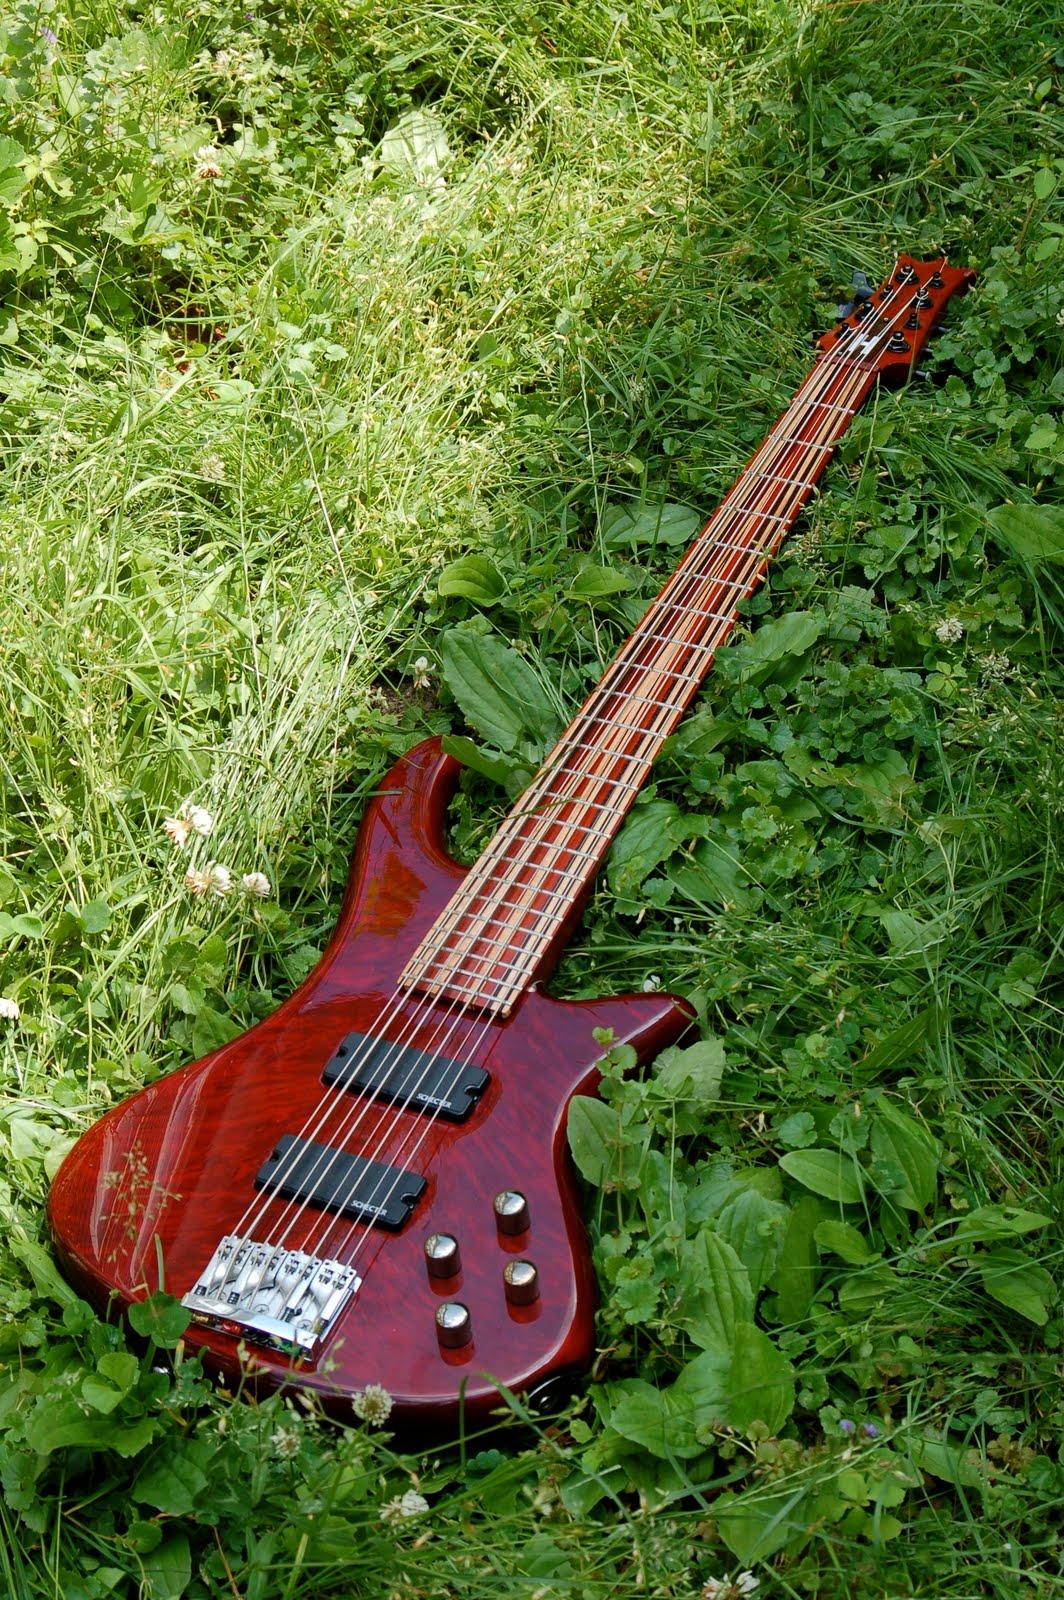 holcomb guitars 8 string bass. Black Bedroom Furniture Sets. Home Design Ideas